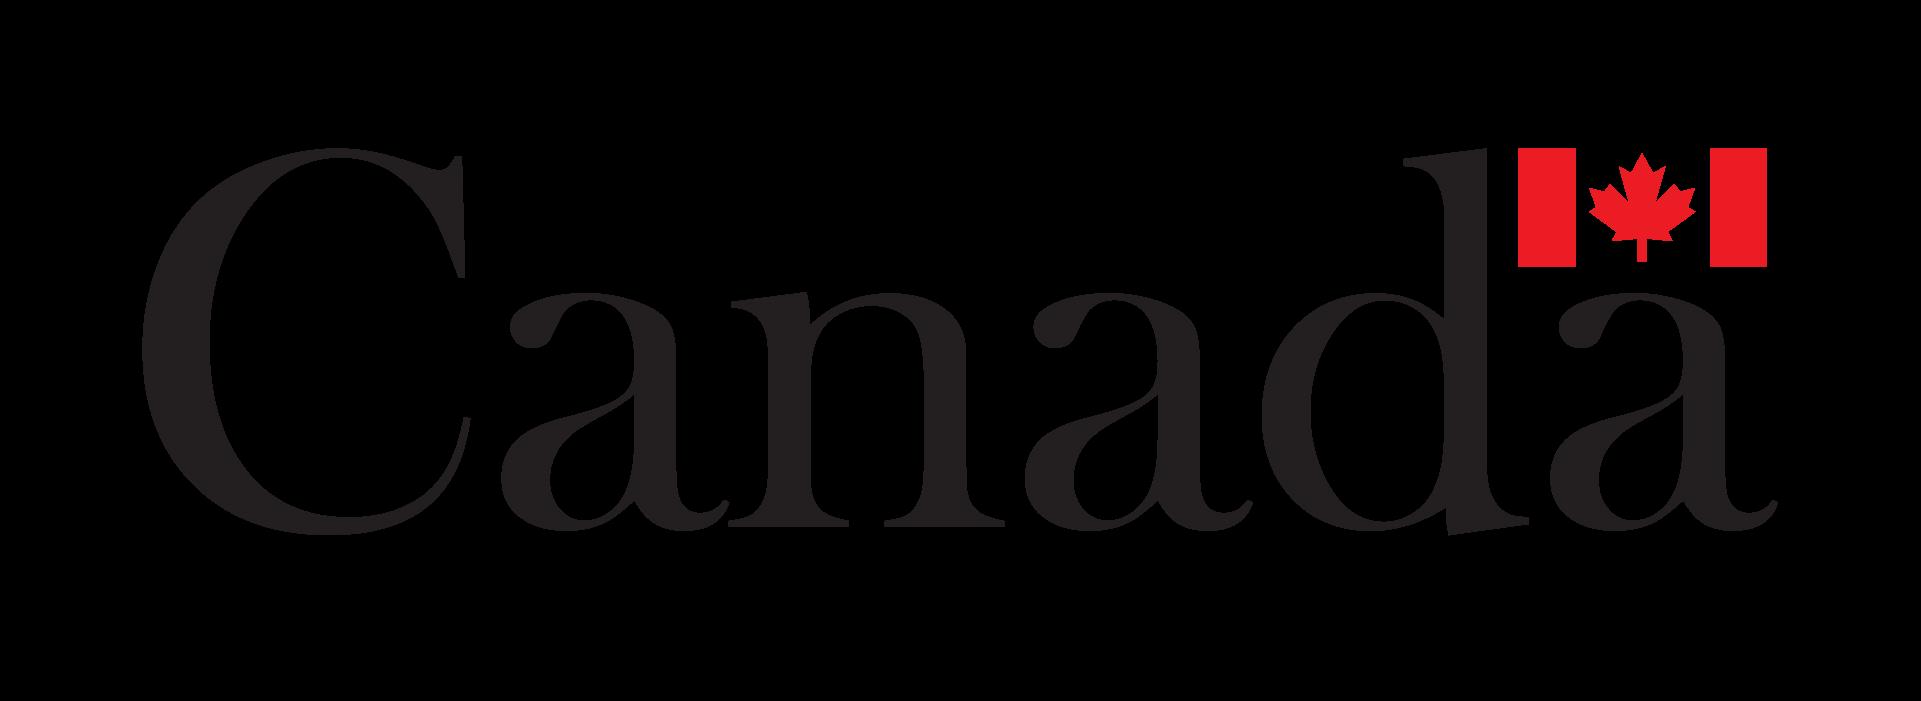 govt-canada-logo-full